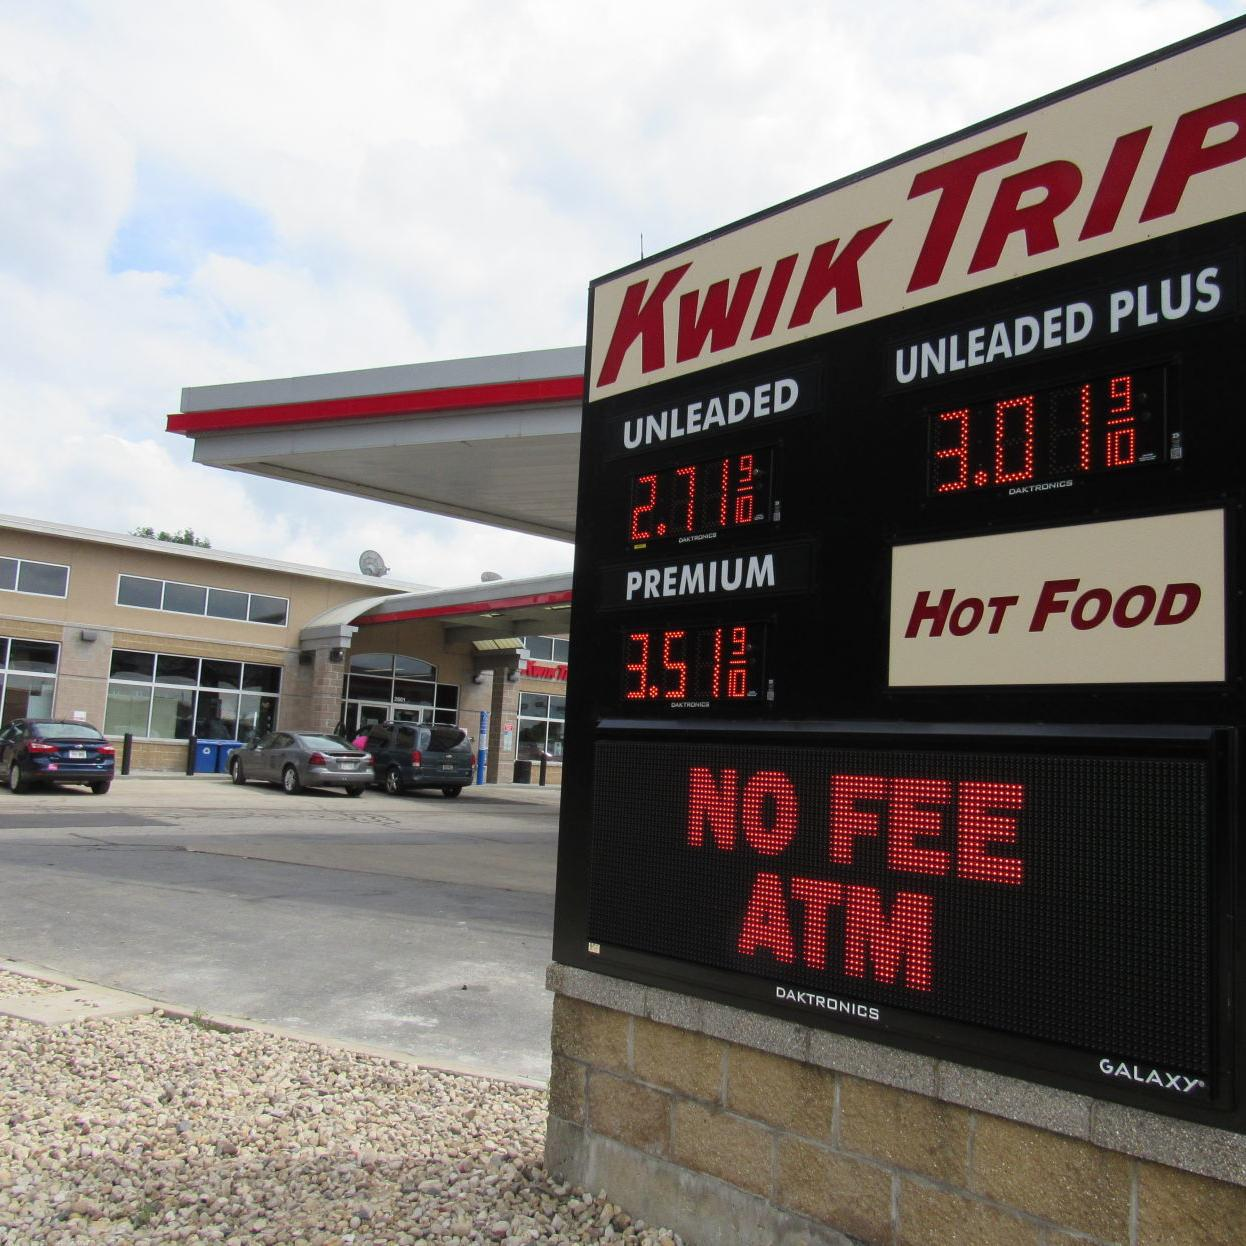 Kwik Trip stores adding in-store digital advertising screens